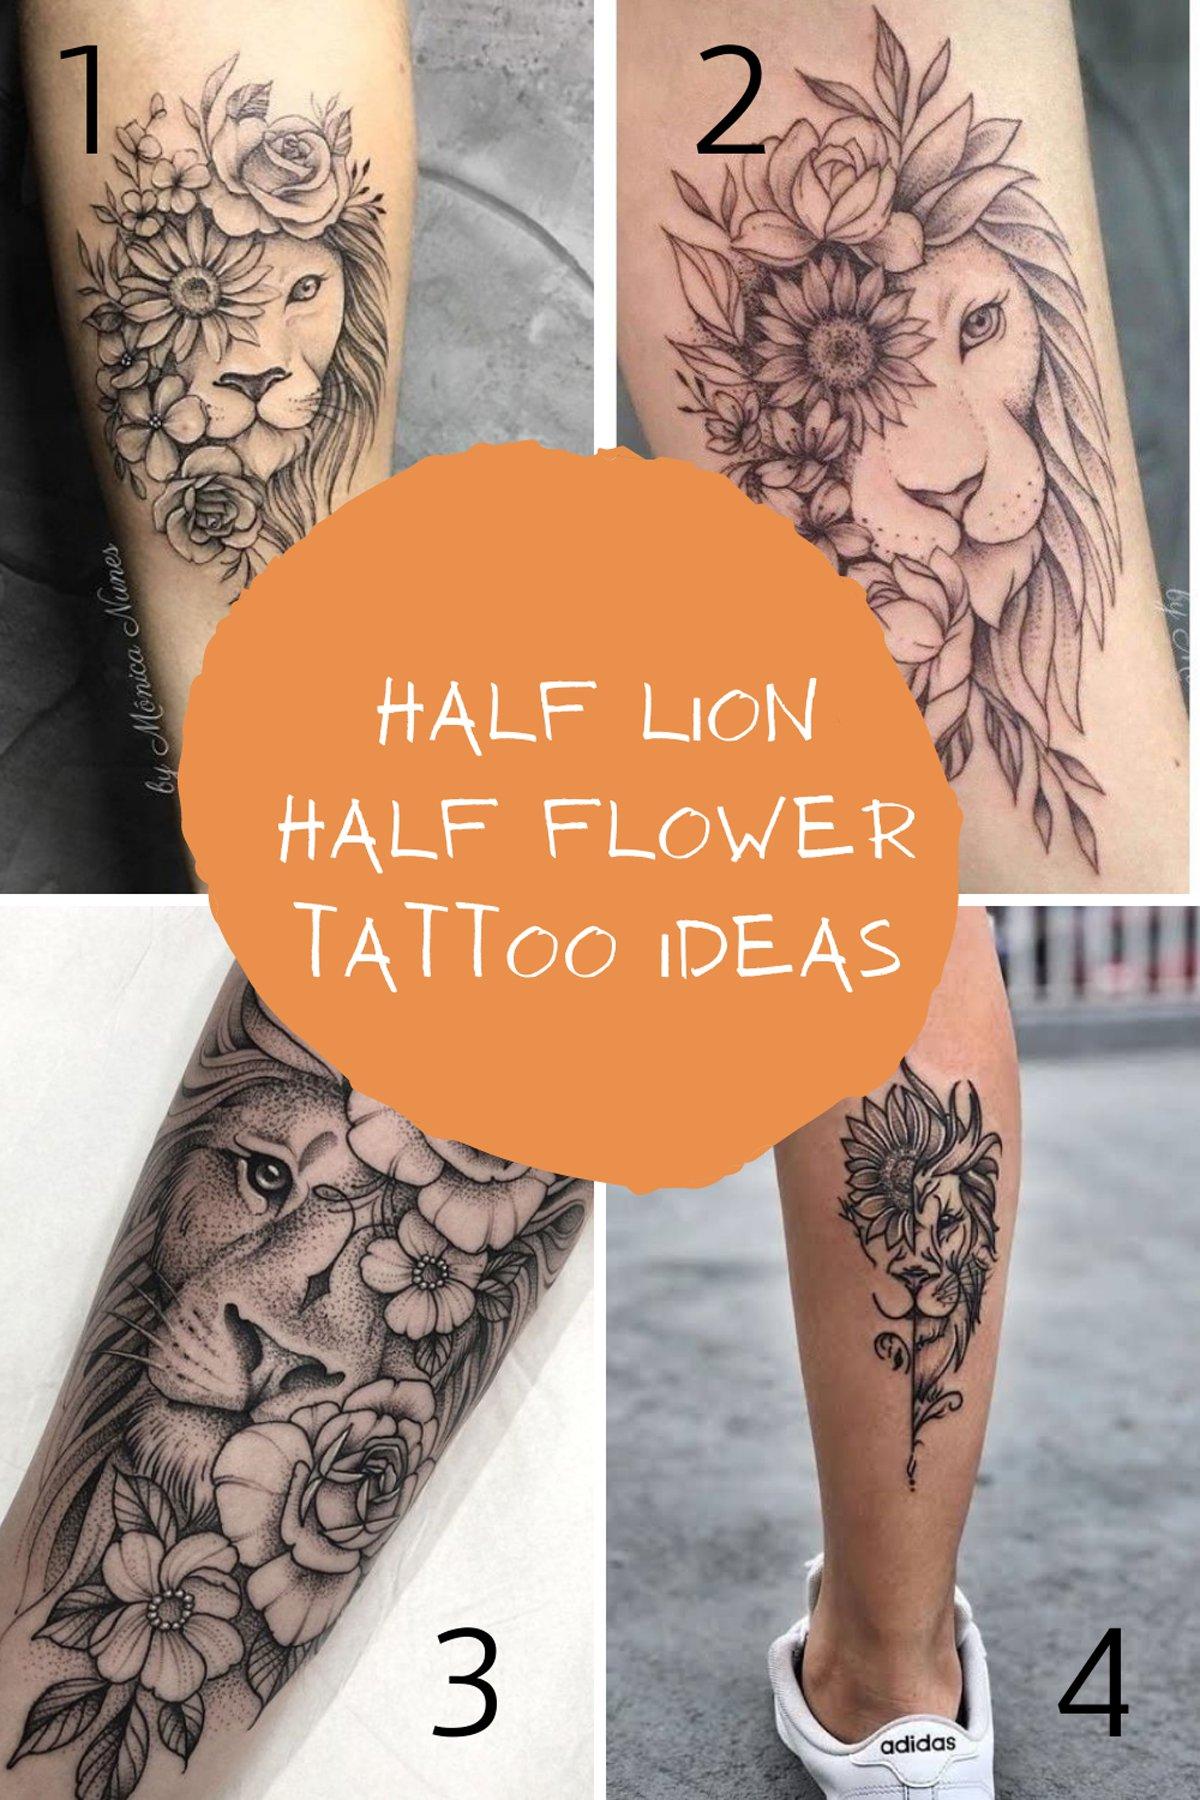 Half Flower Tattoos With Lion